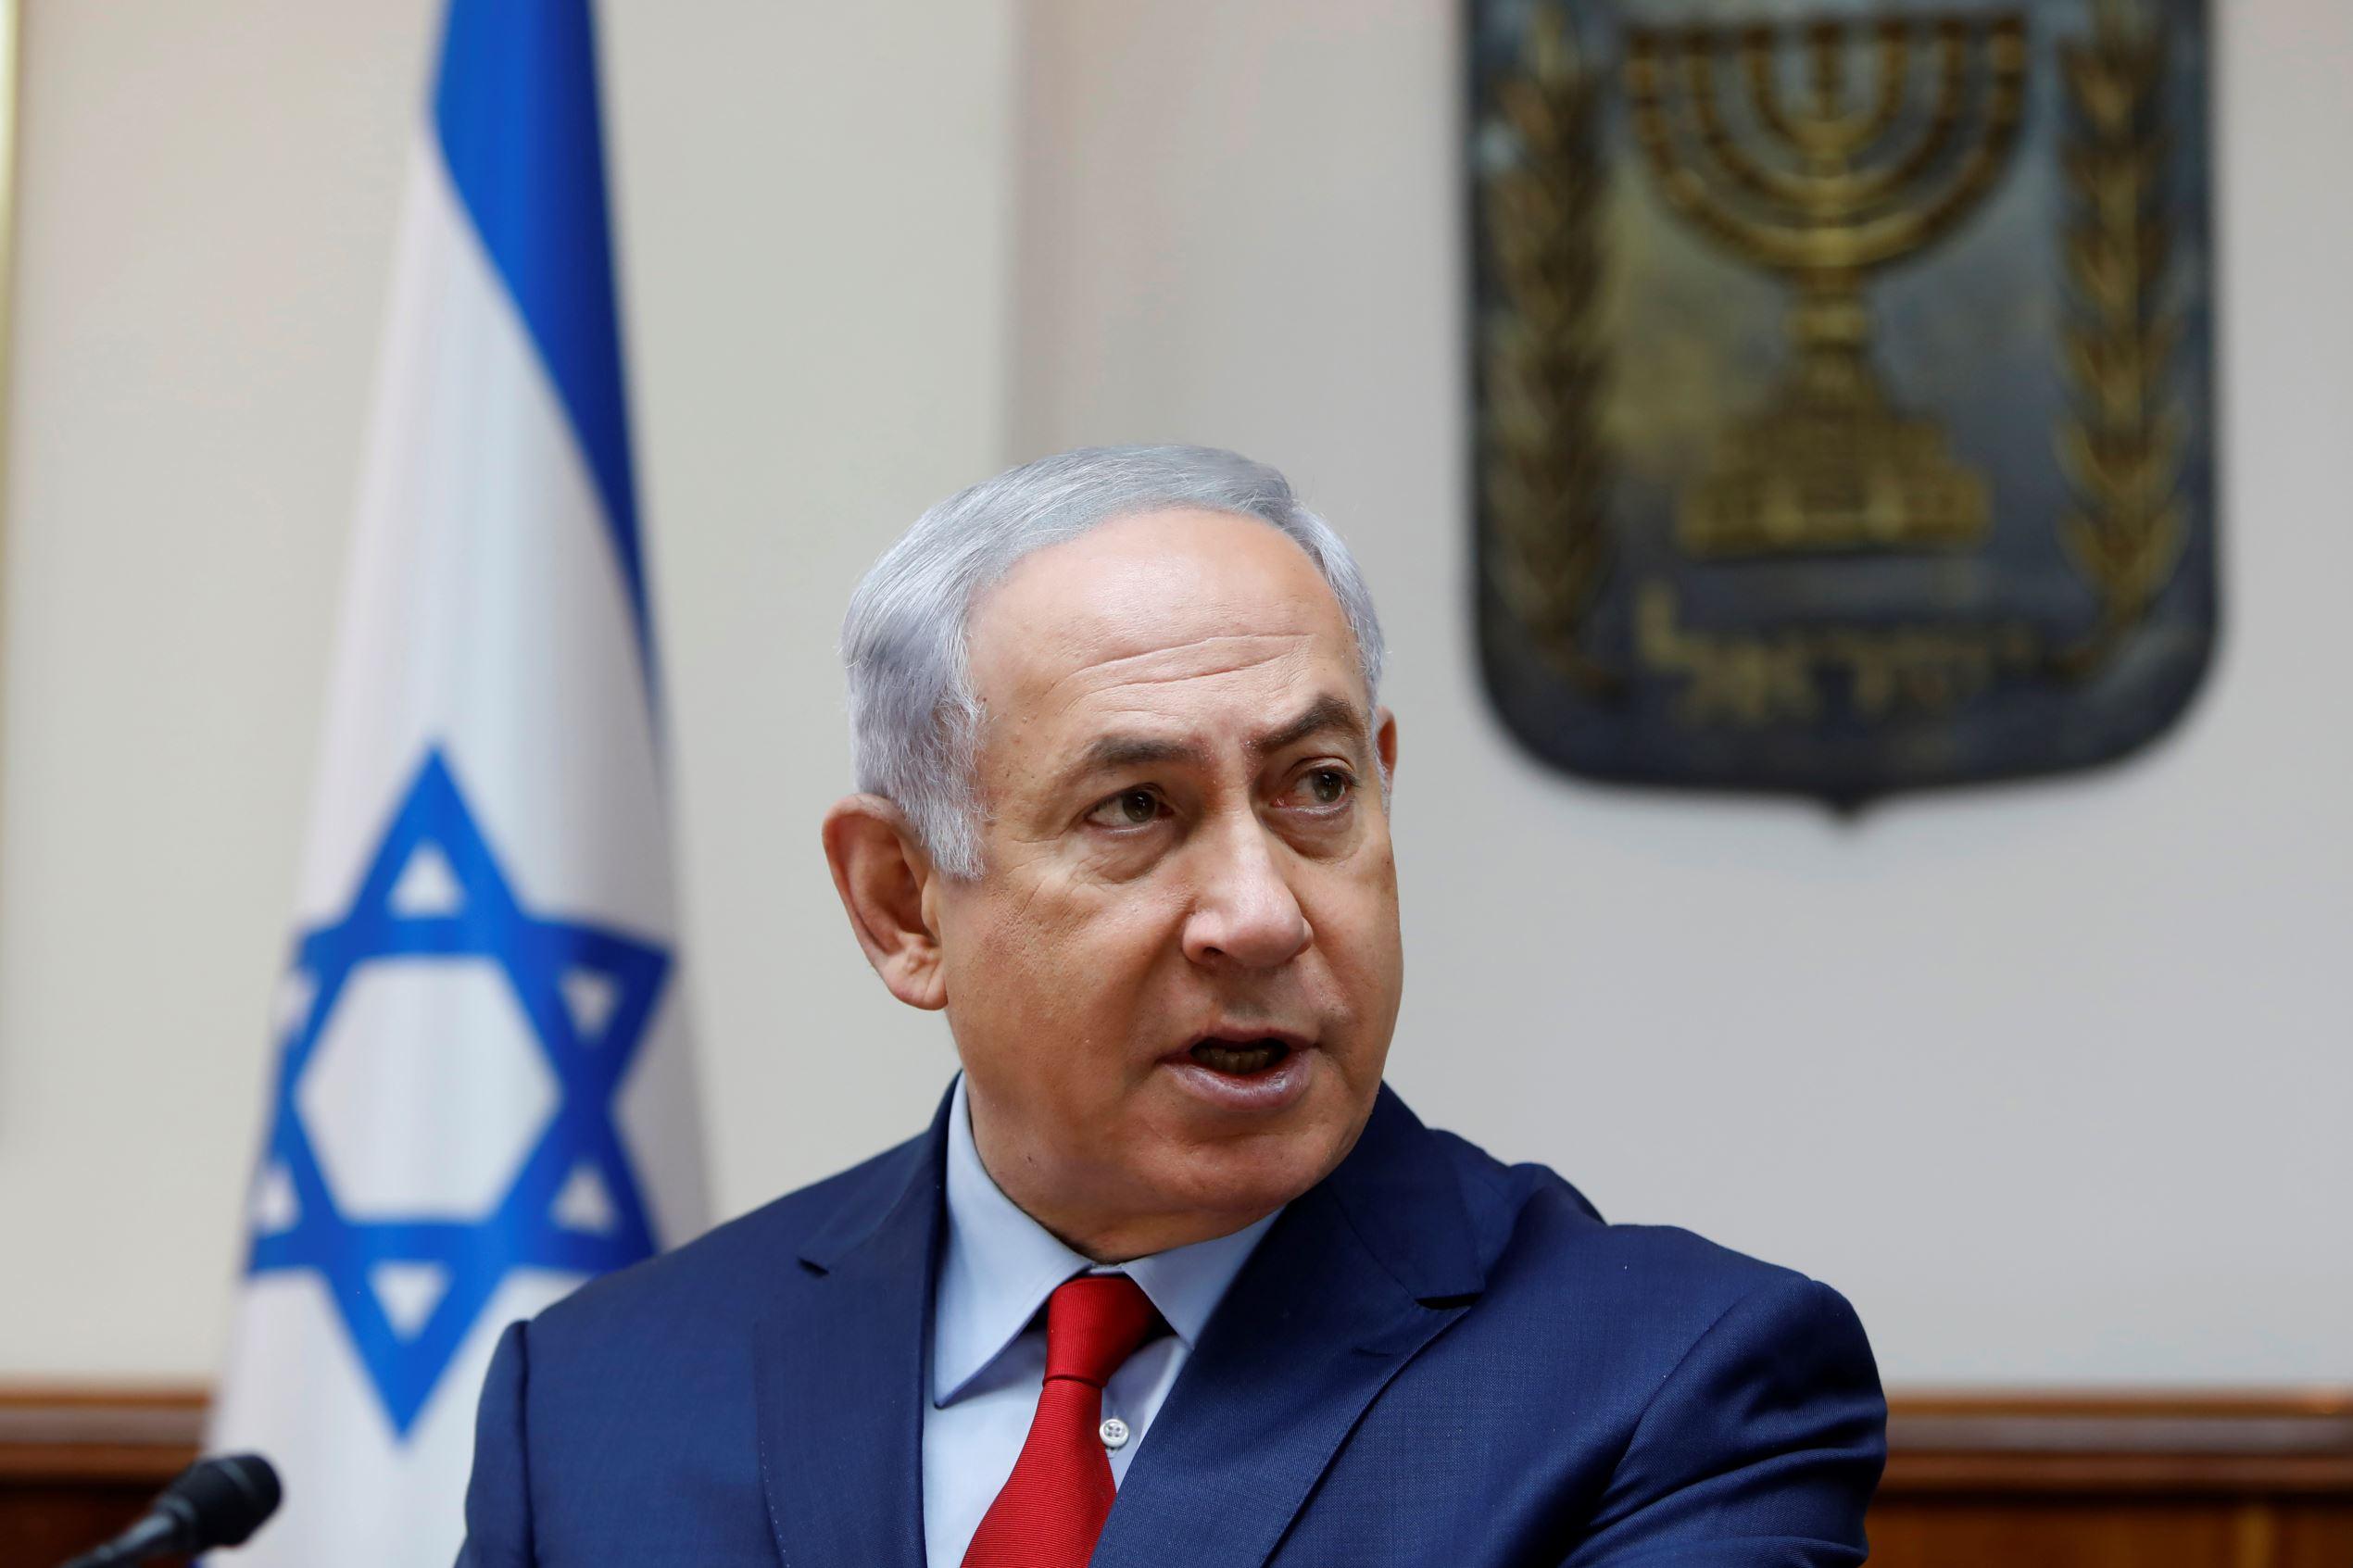 Israeli leader criticized for response to Charlottesville